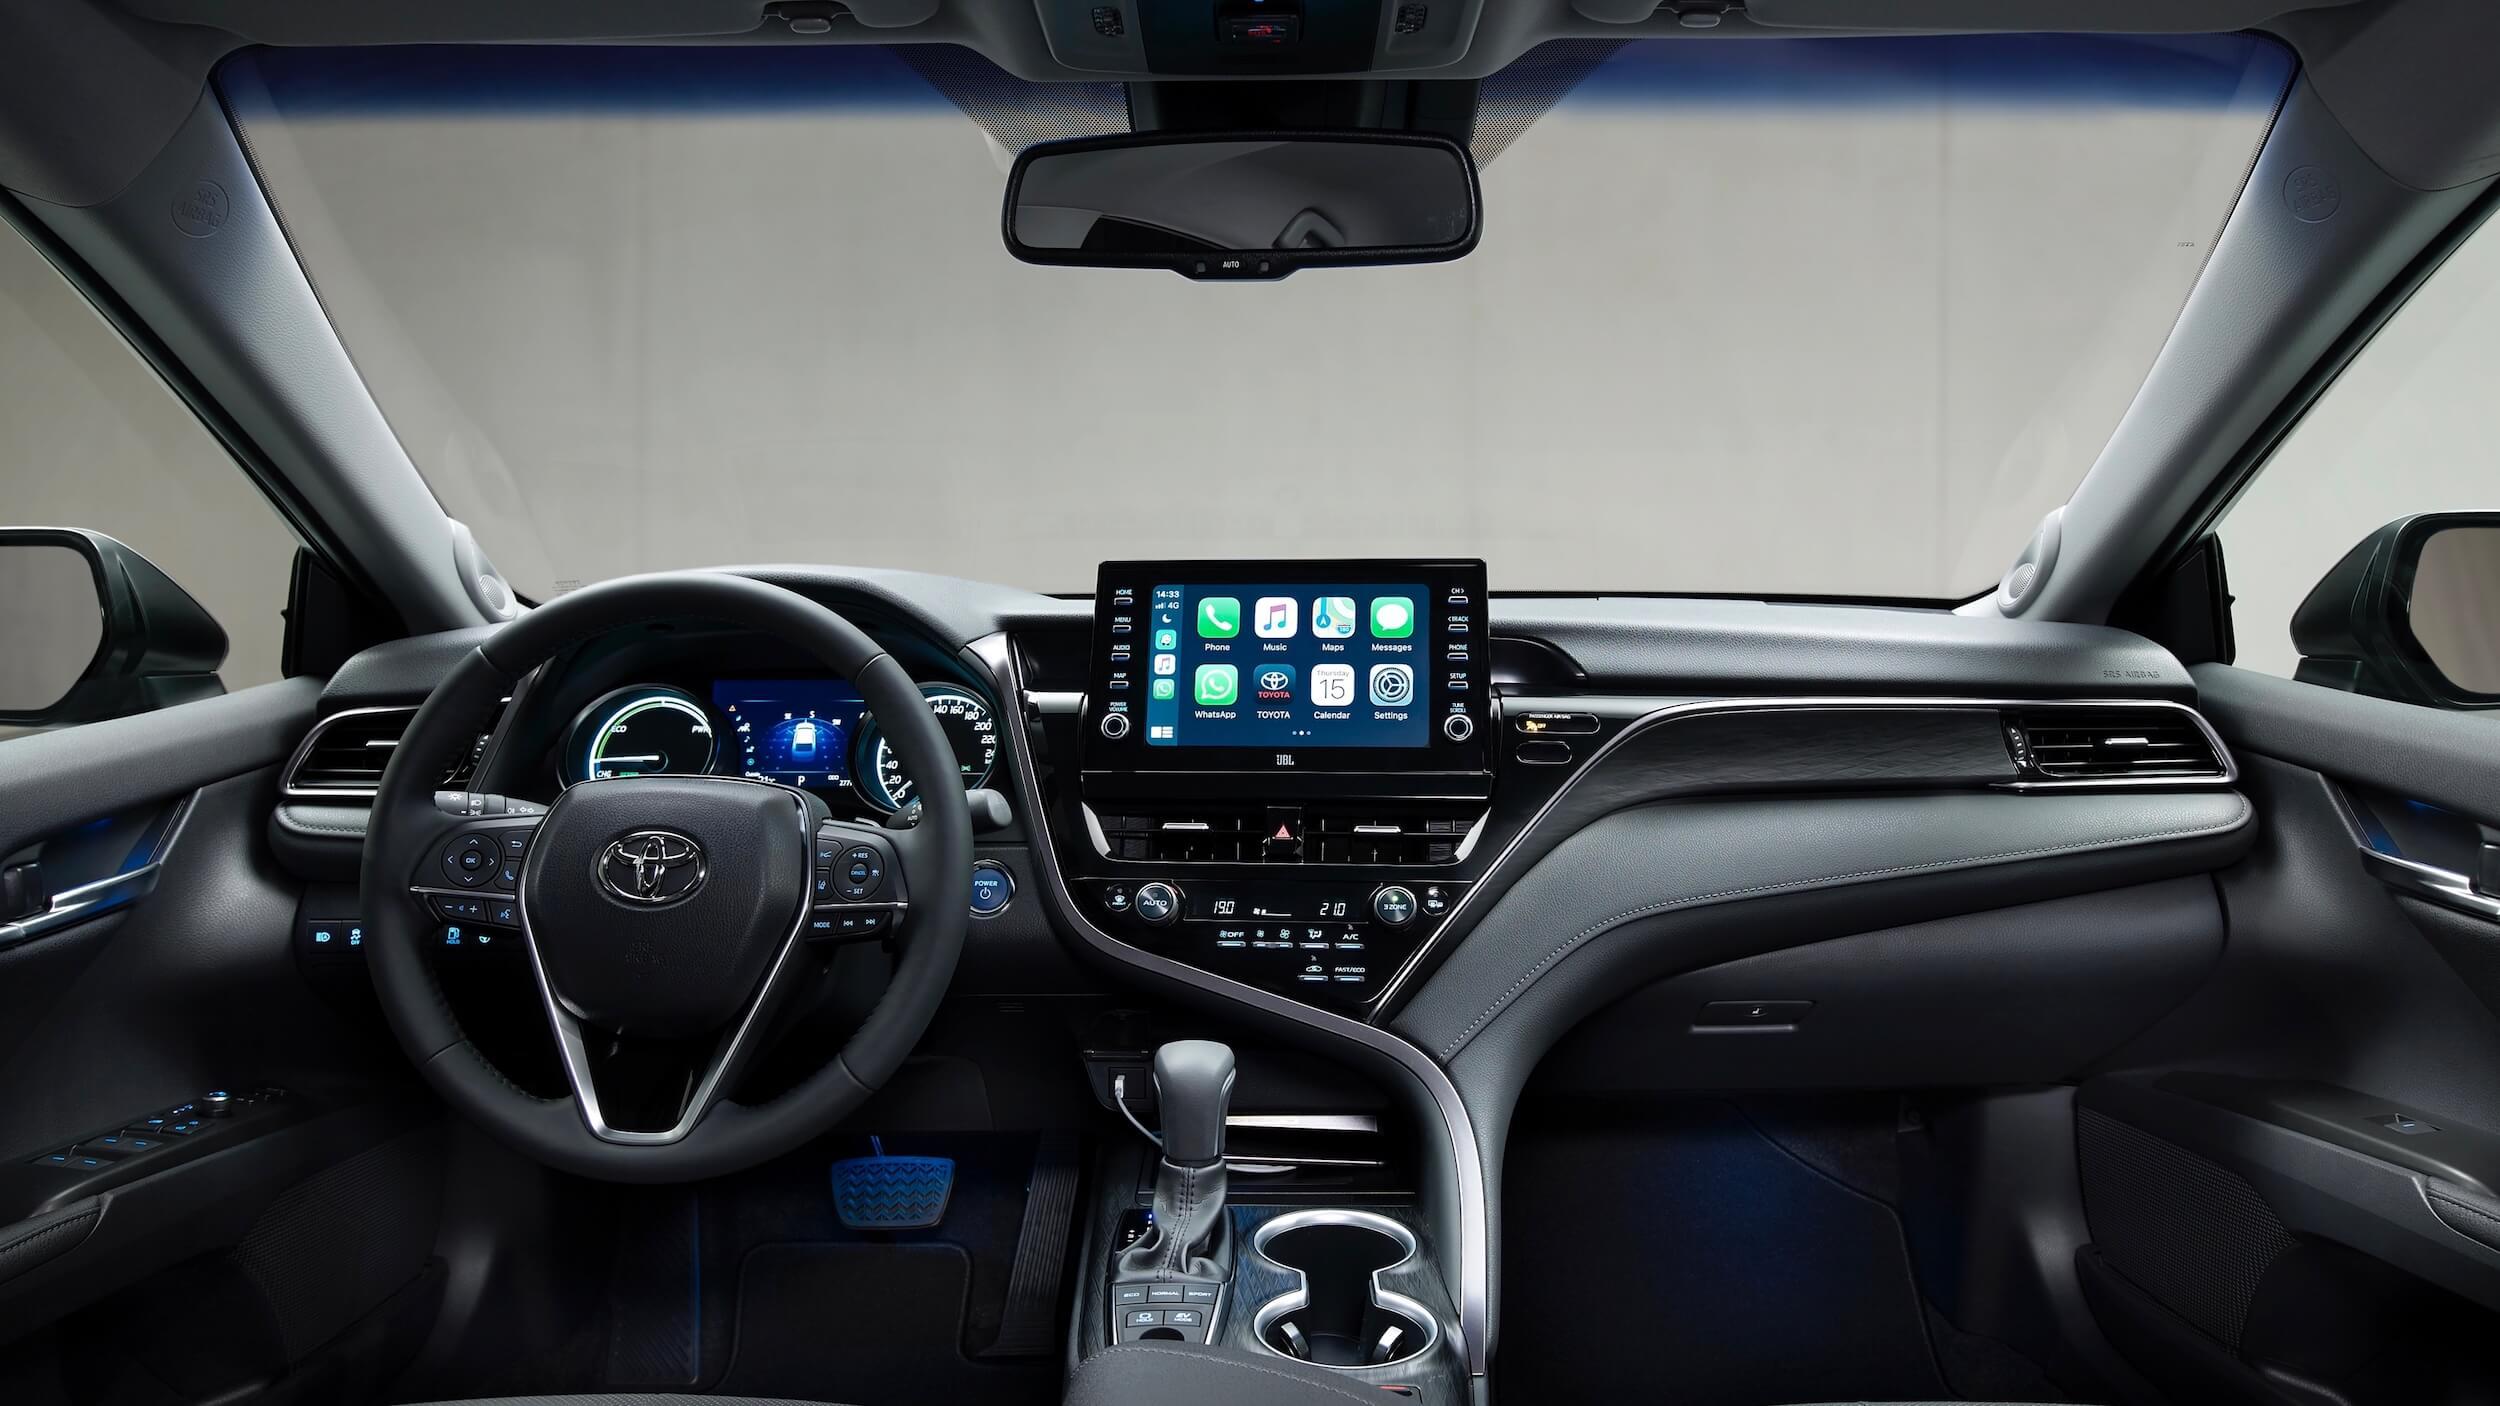 Toyota Camry Hybrid 2021 dashboard